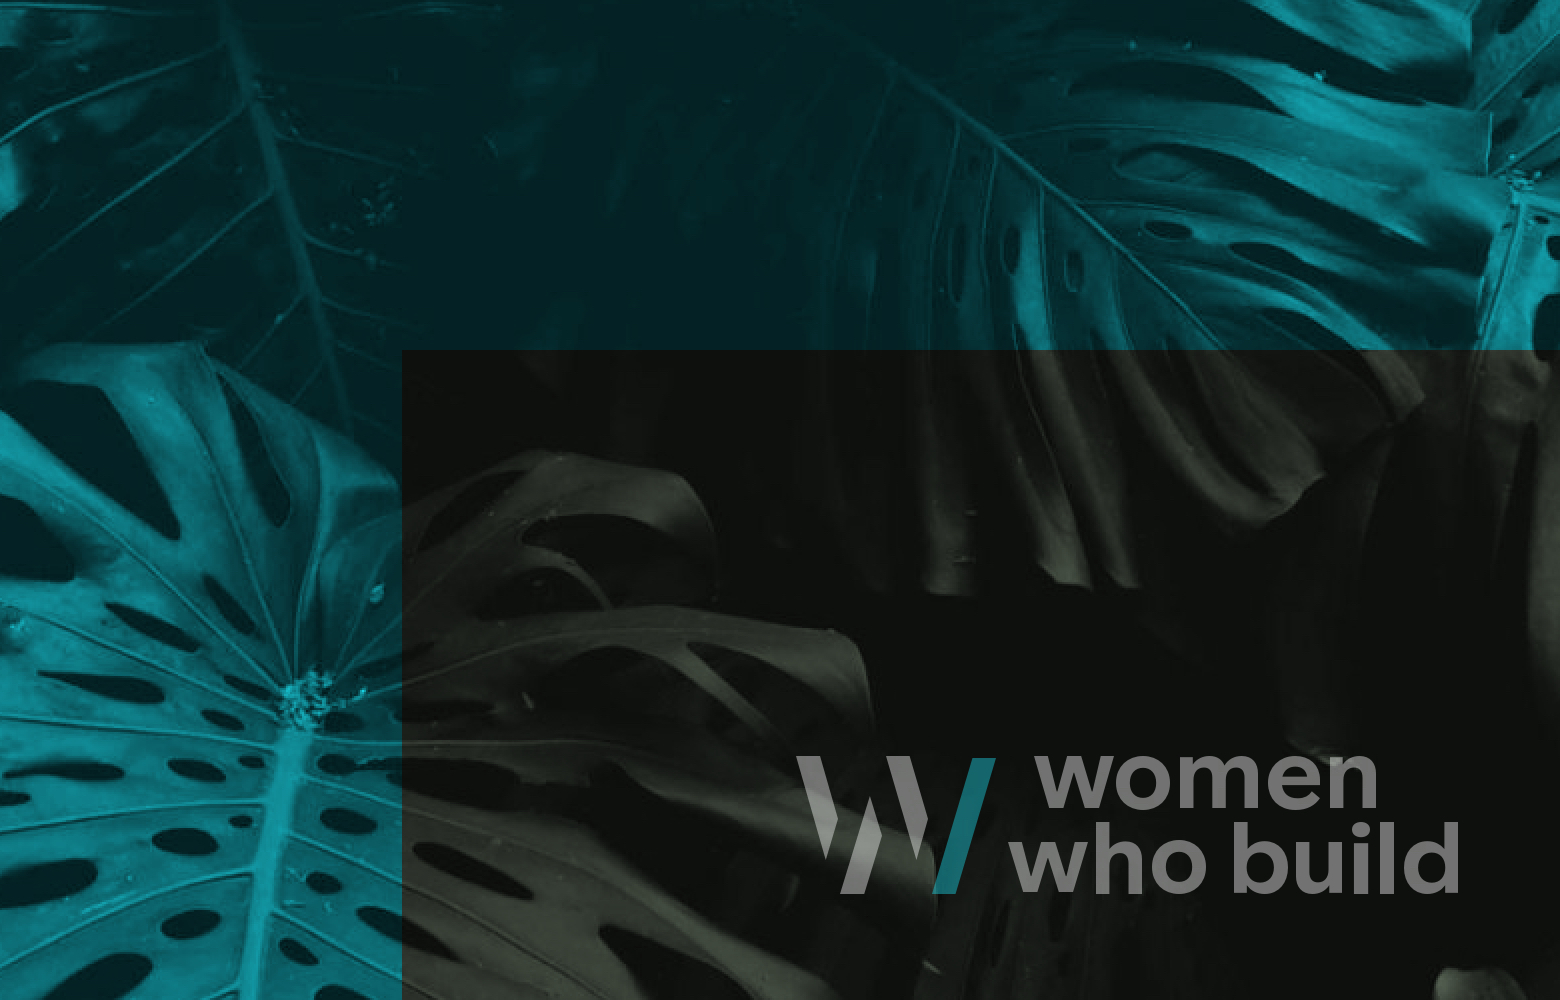 Women Who Build logo against cyan foliage.